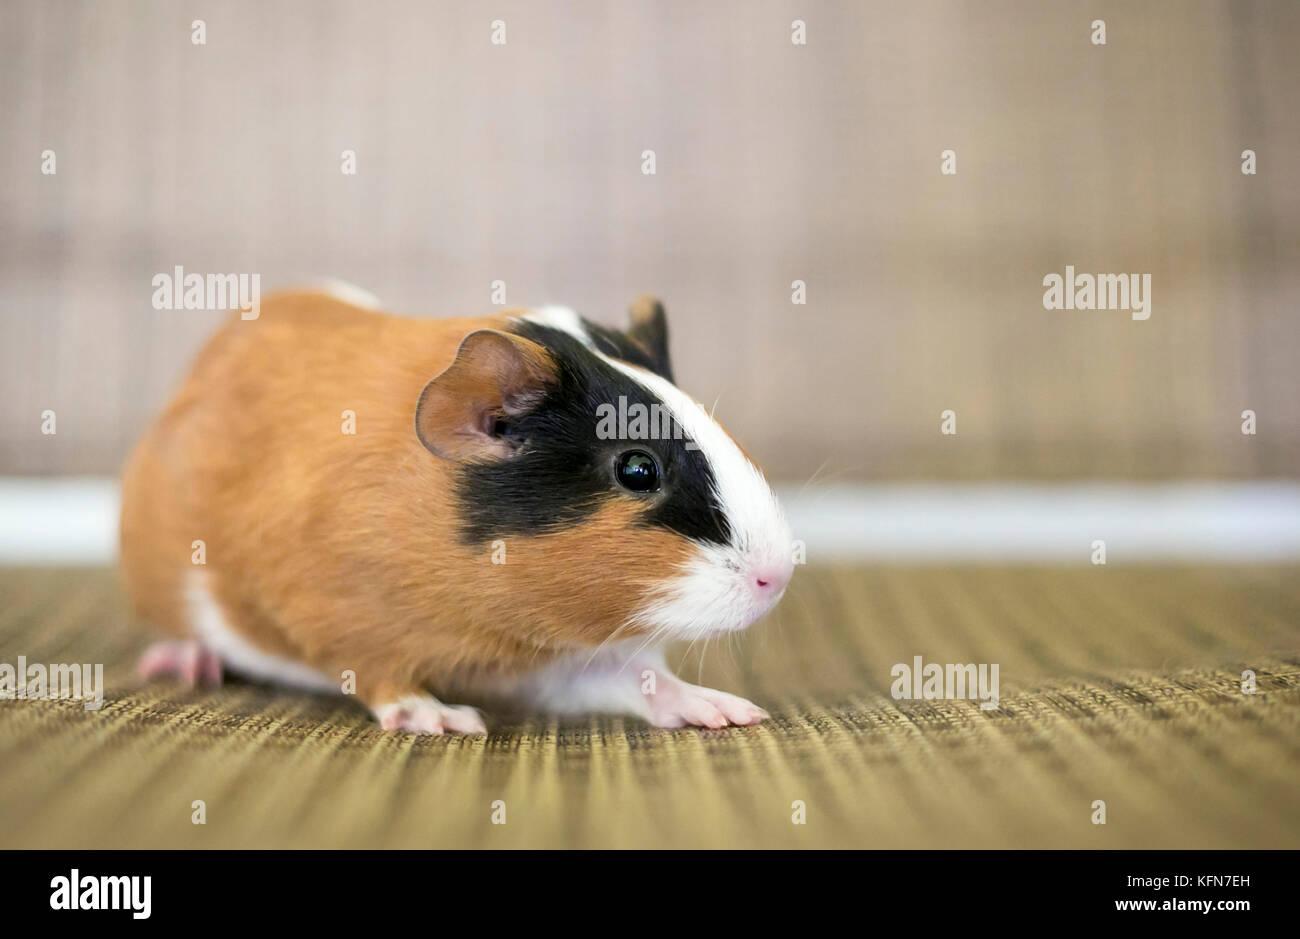 Portrait of a tricolor American Guinea Pig - Stock Image